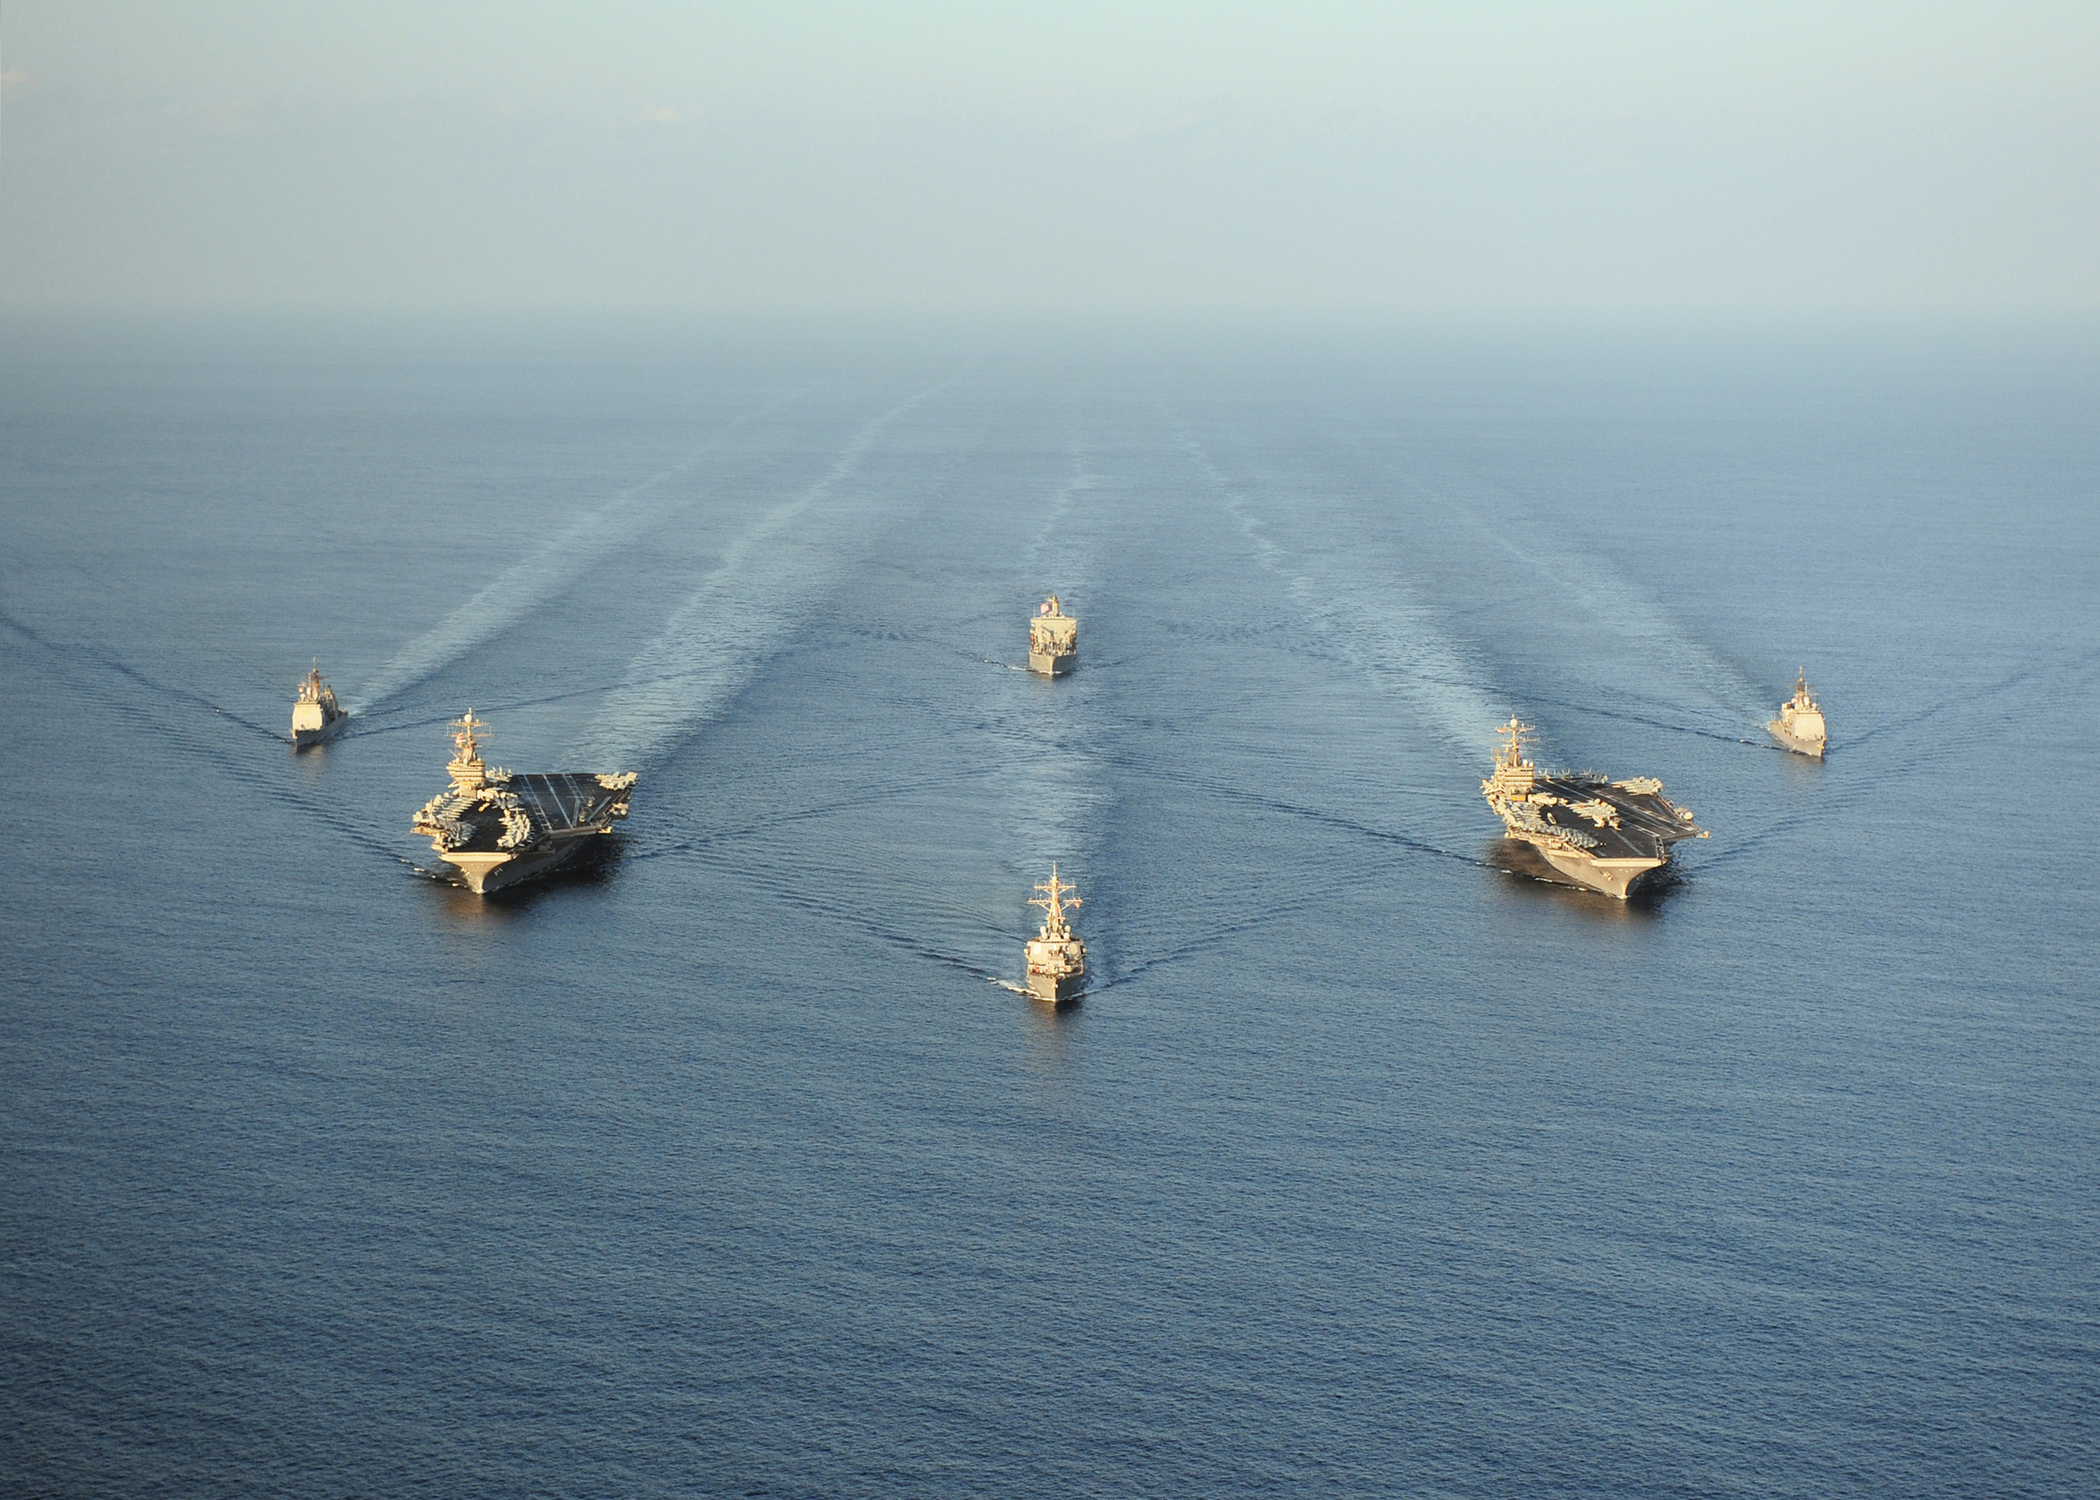 Carrier Strike Group Ten 5